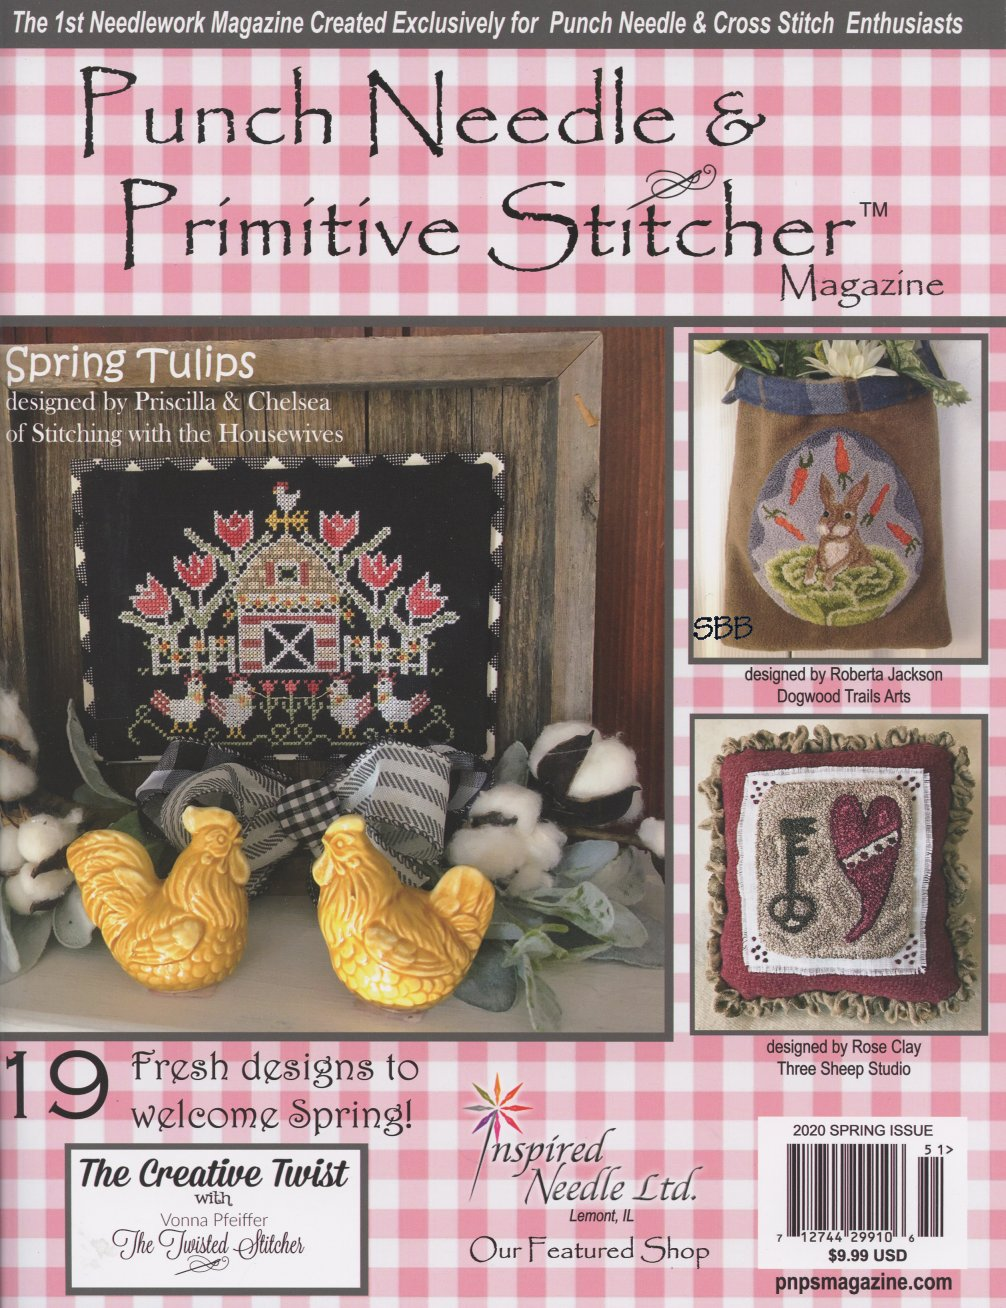 Punch Needle & Primitive Stitcher Magazine Spring 2020